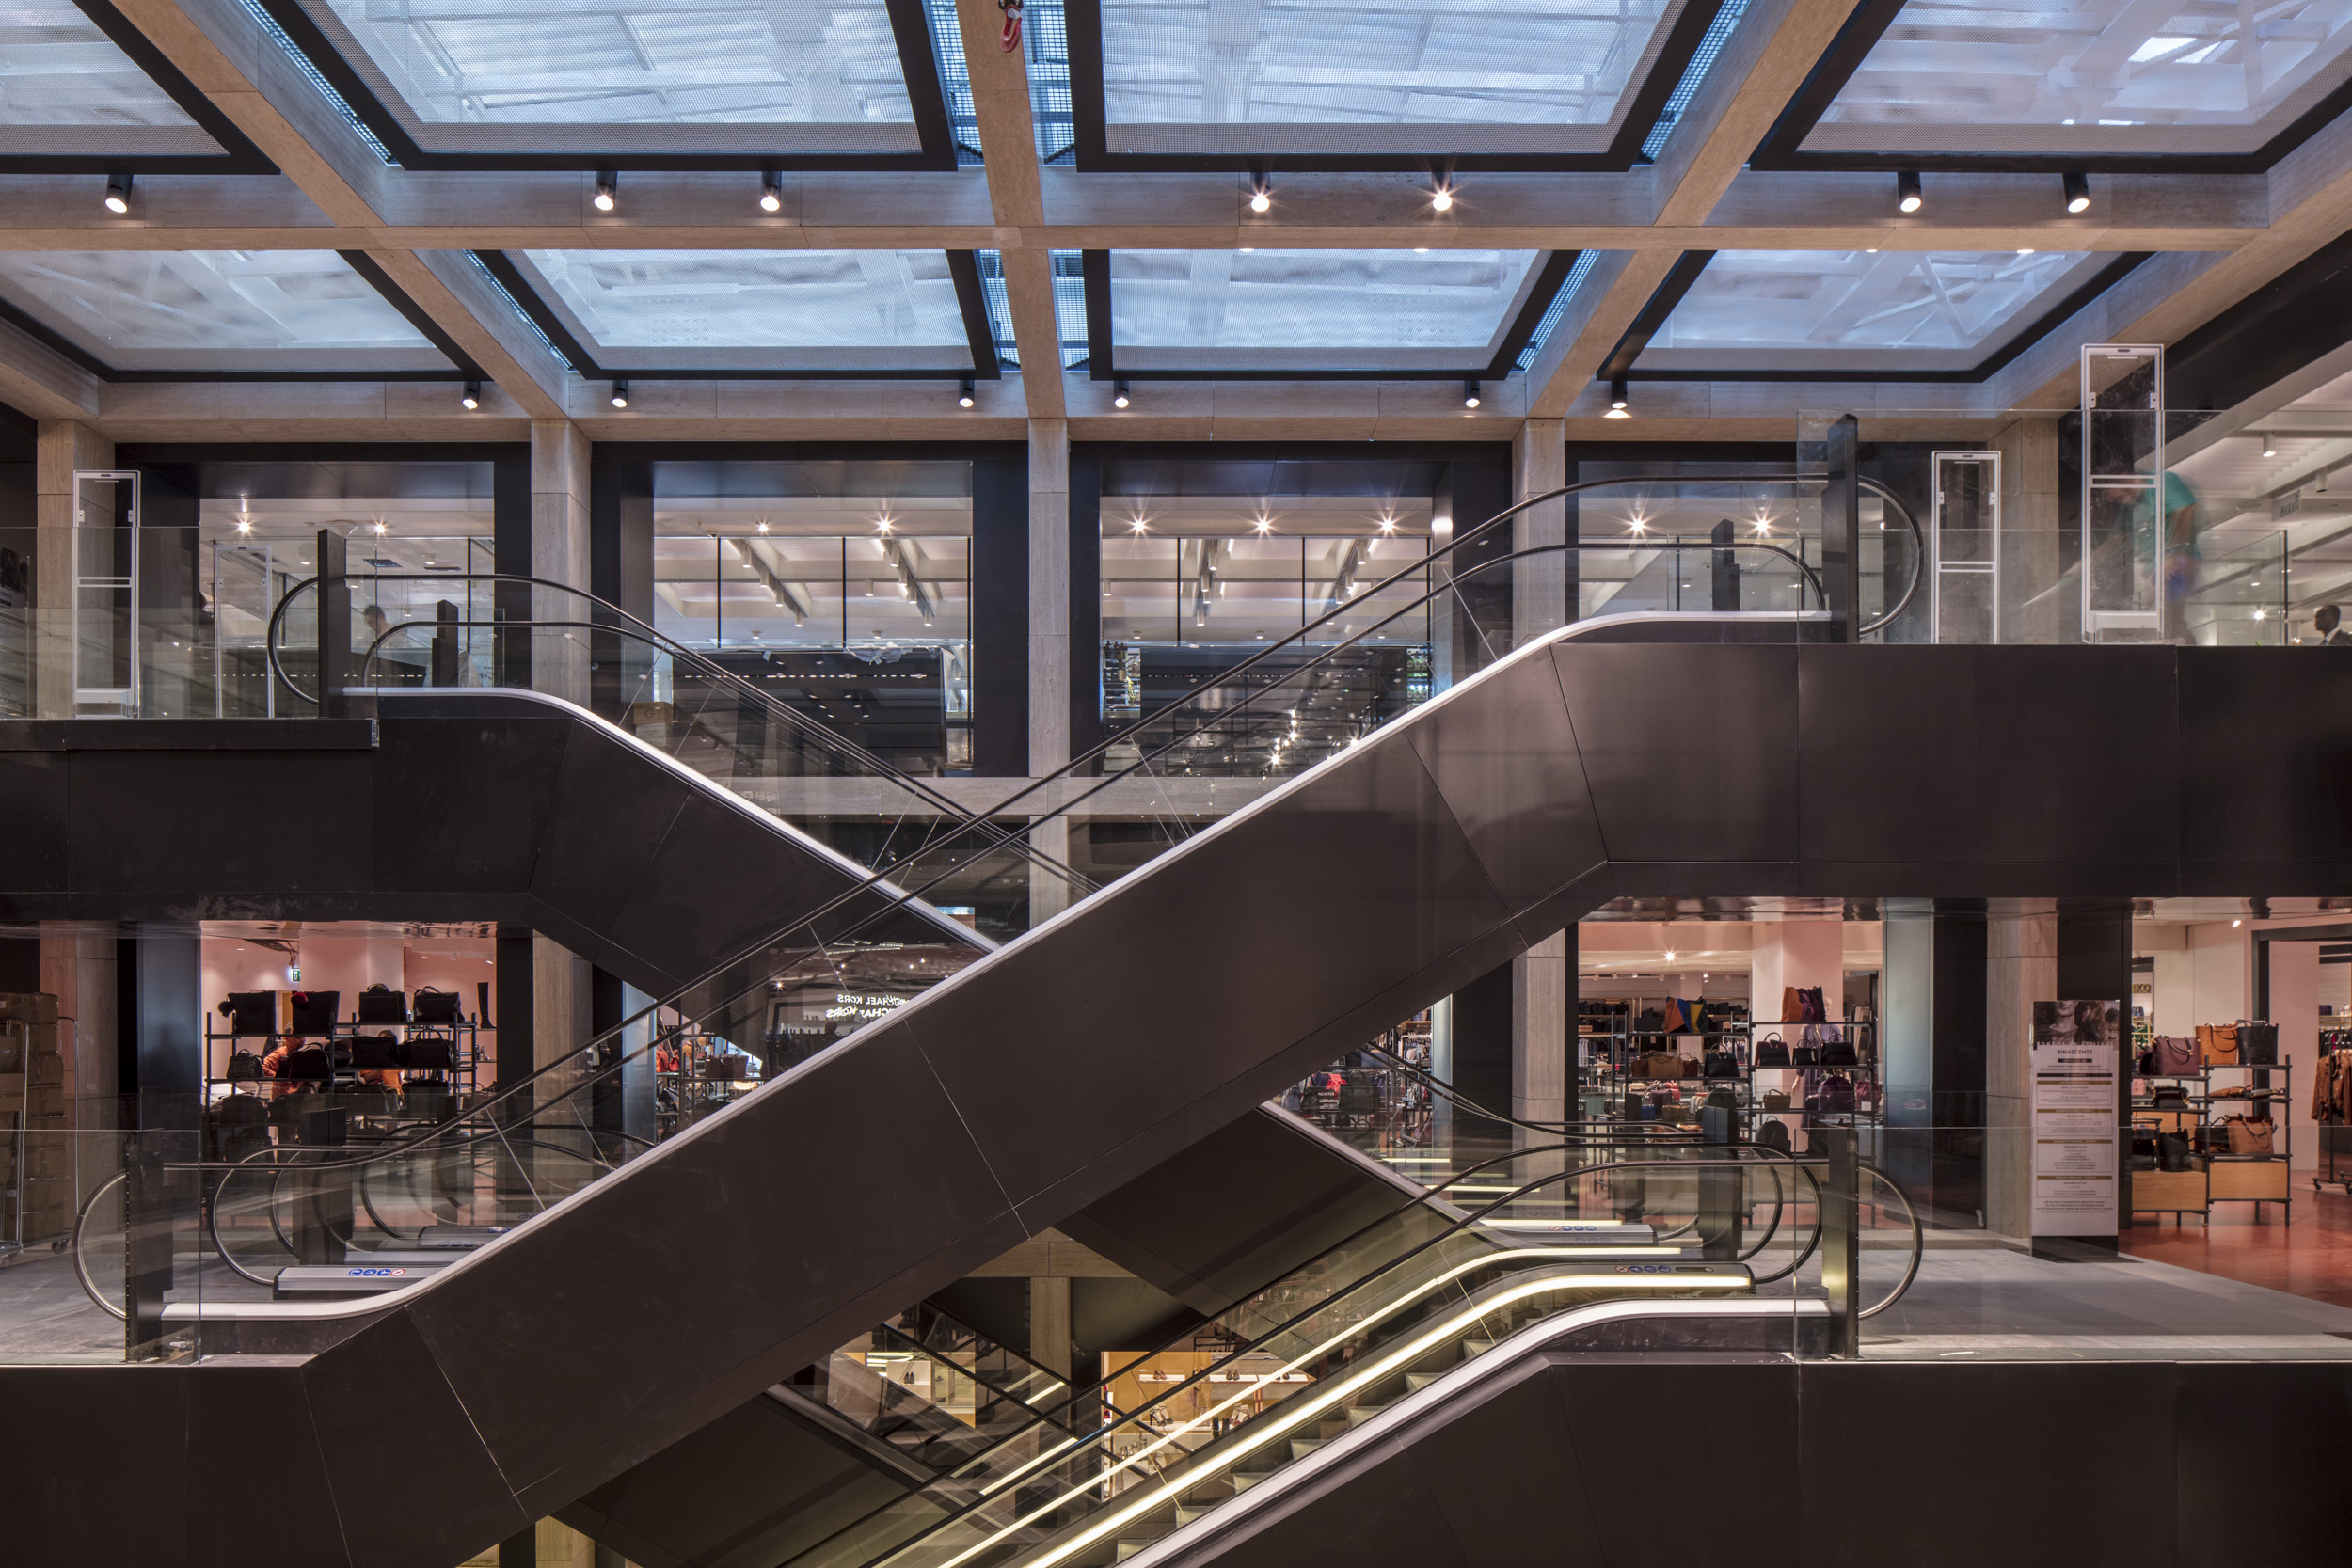 Rinascente-stairs-41751.jpg